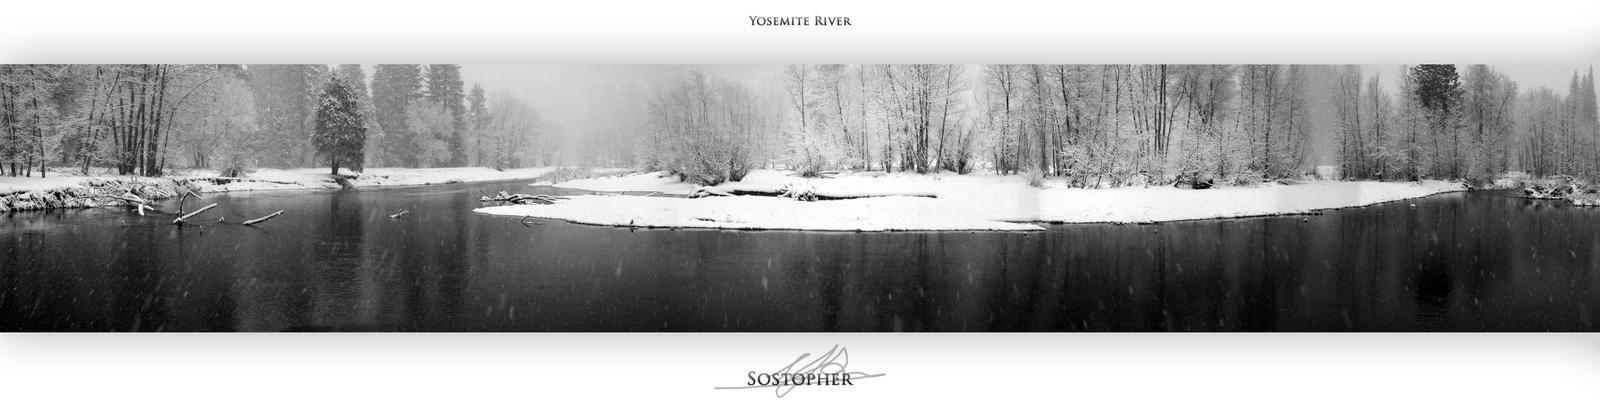 Yosemite River by Sostopher